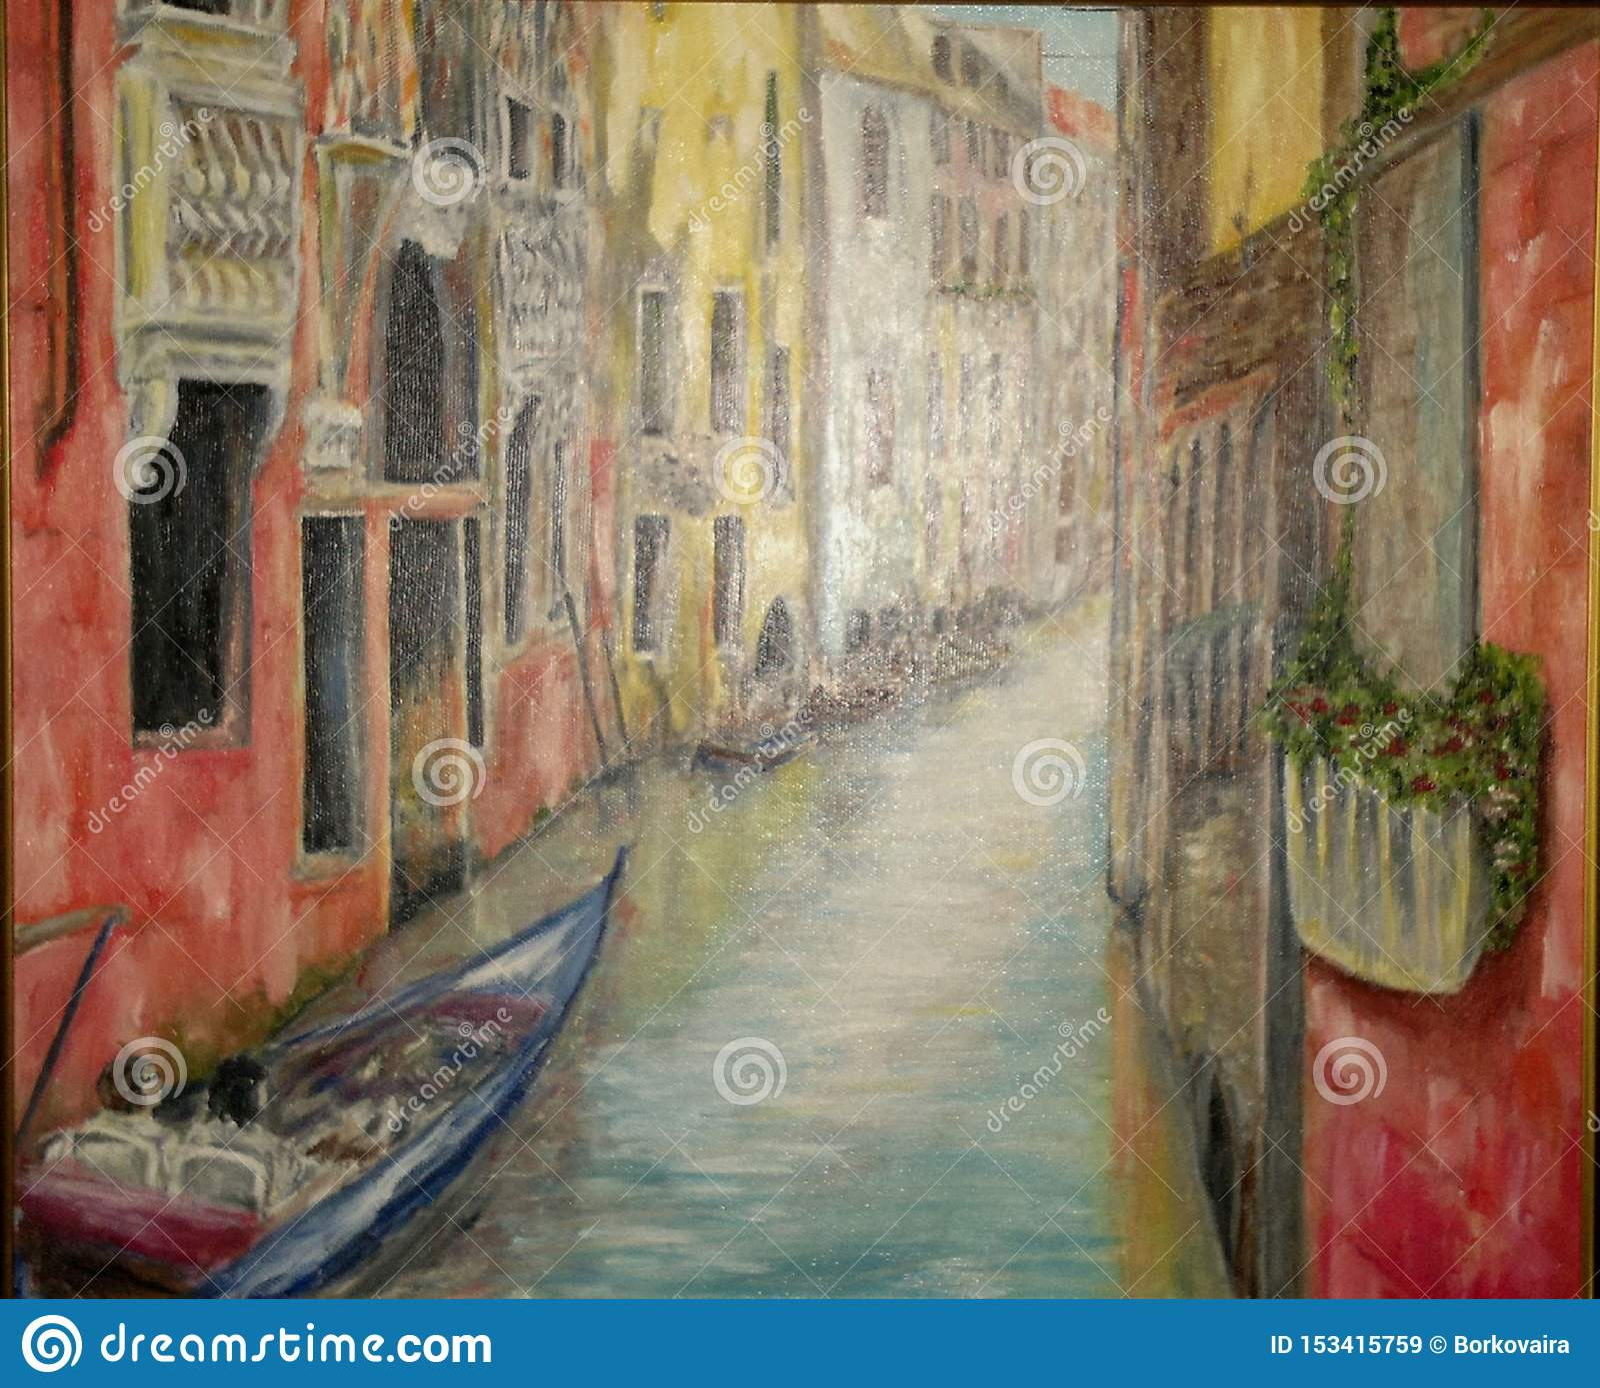 Painting, oil painting `Venice Street`